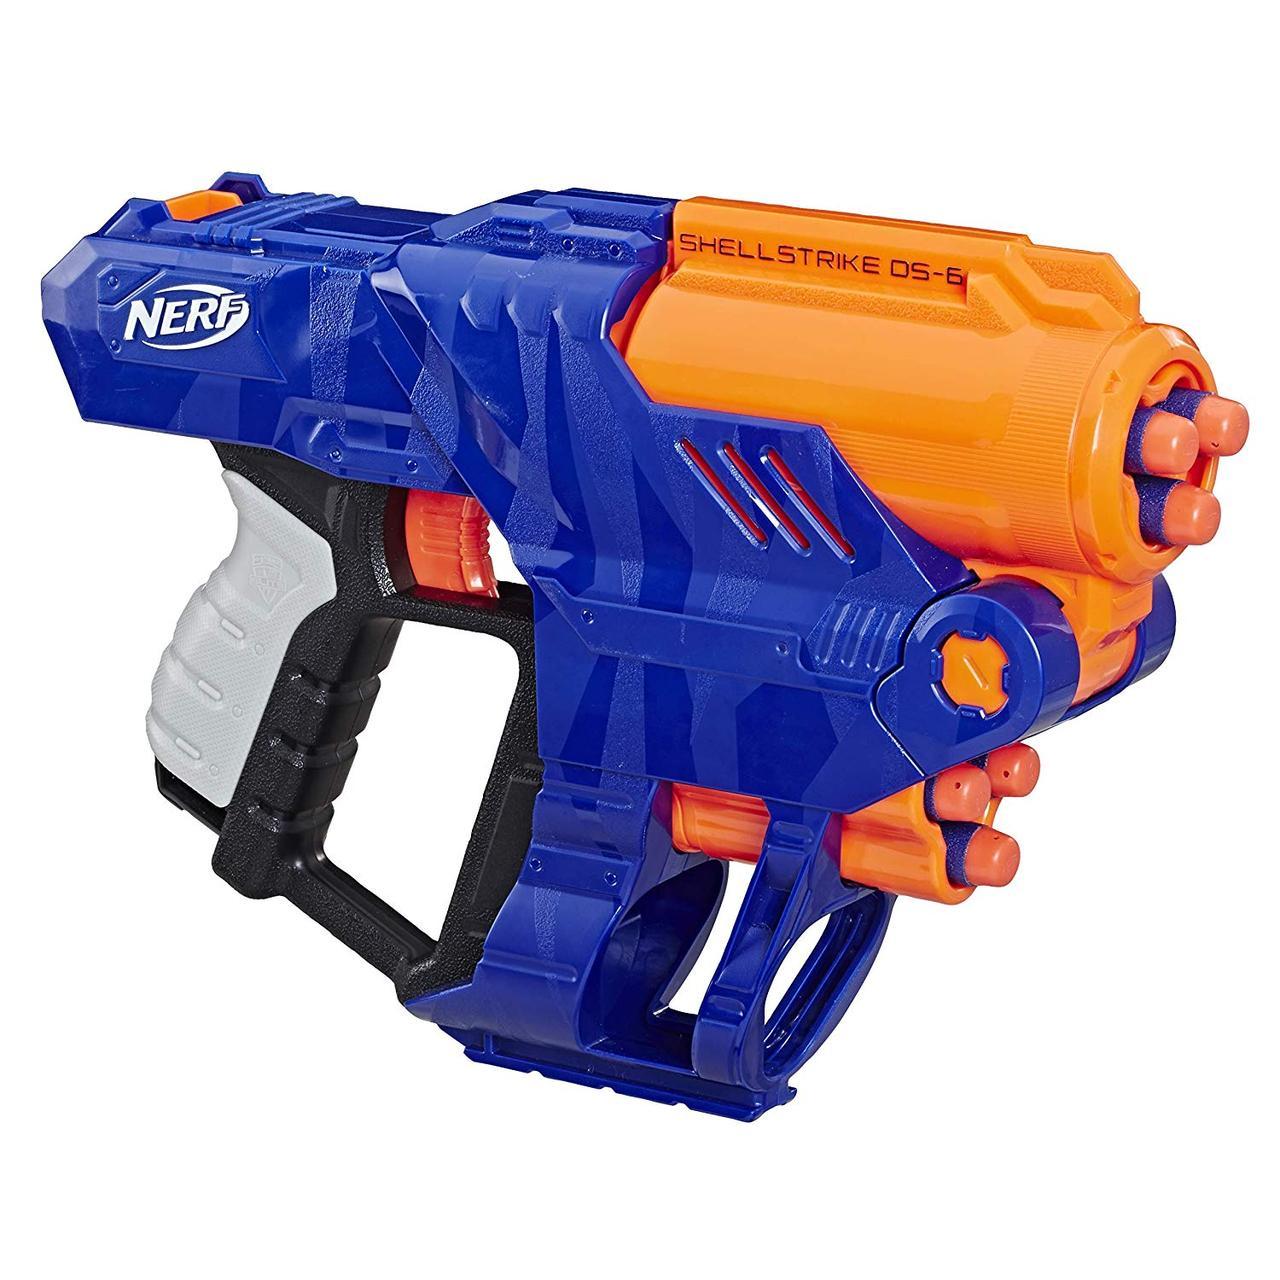 Hasbro Nerf N-Strike Elite Пистолет Бластер Шеллстрайк  DS-6 (ShellStrike DS-6)